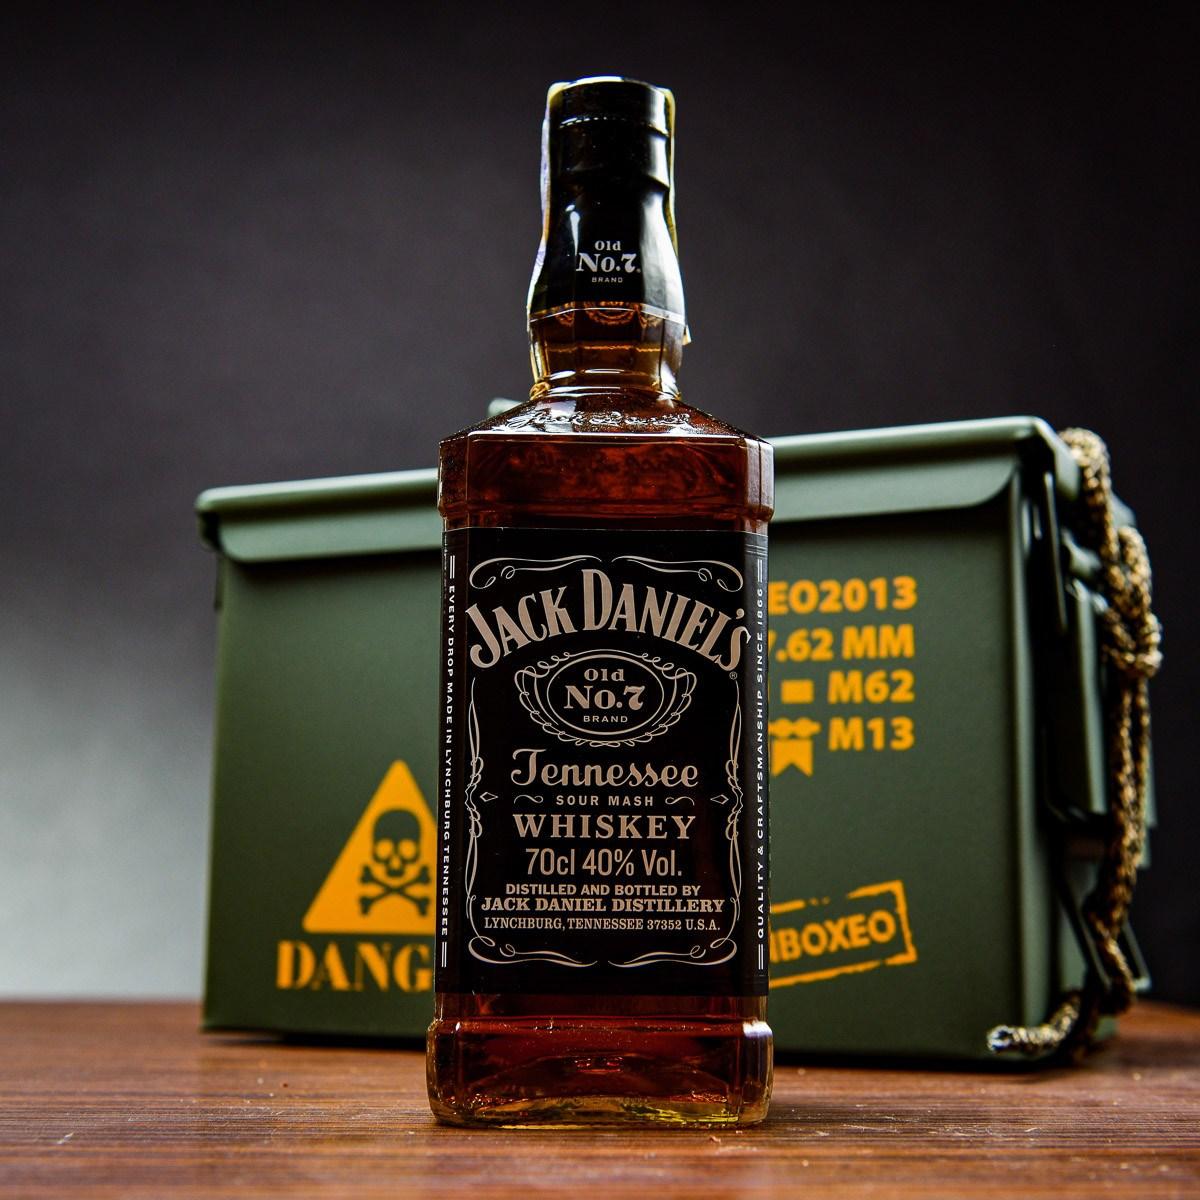 Armyboxeo Jack Daniel's